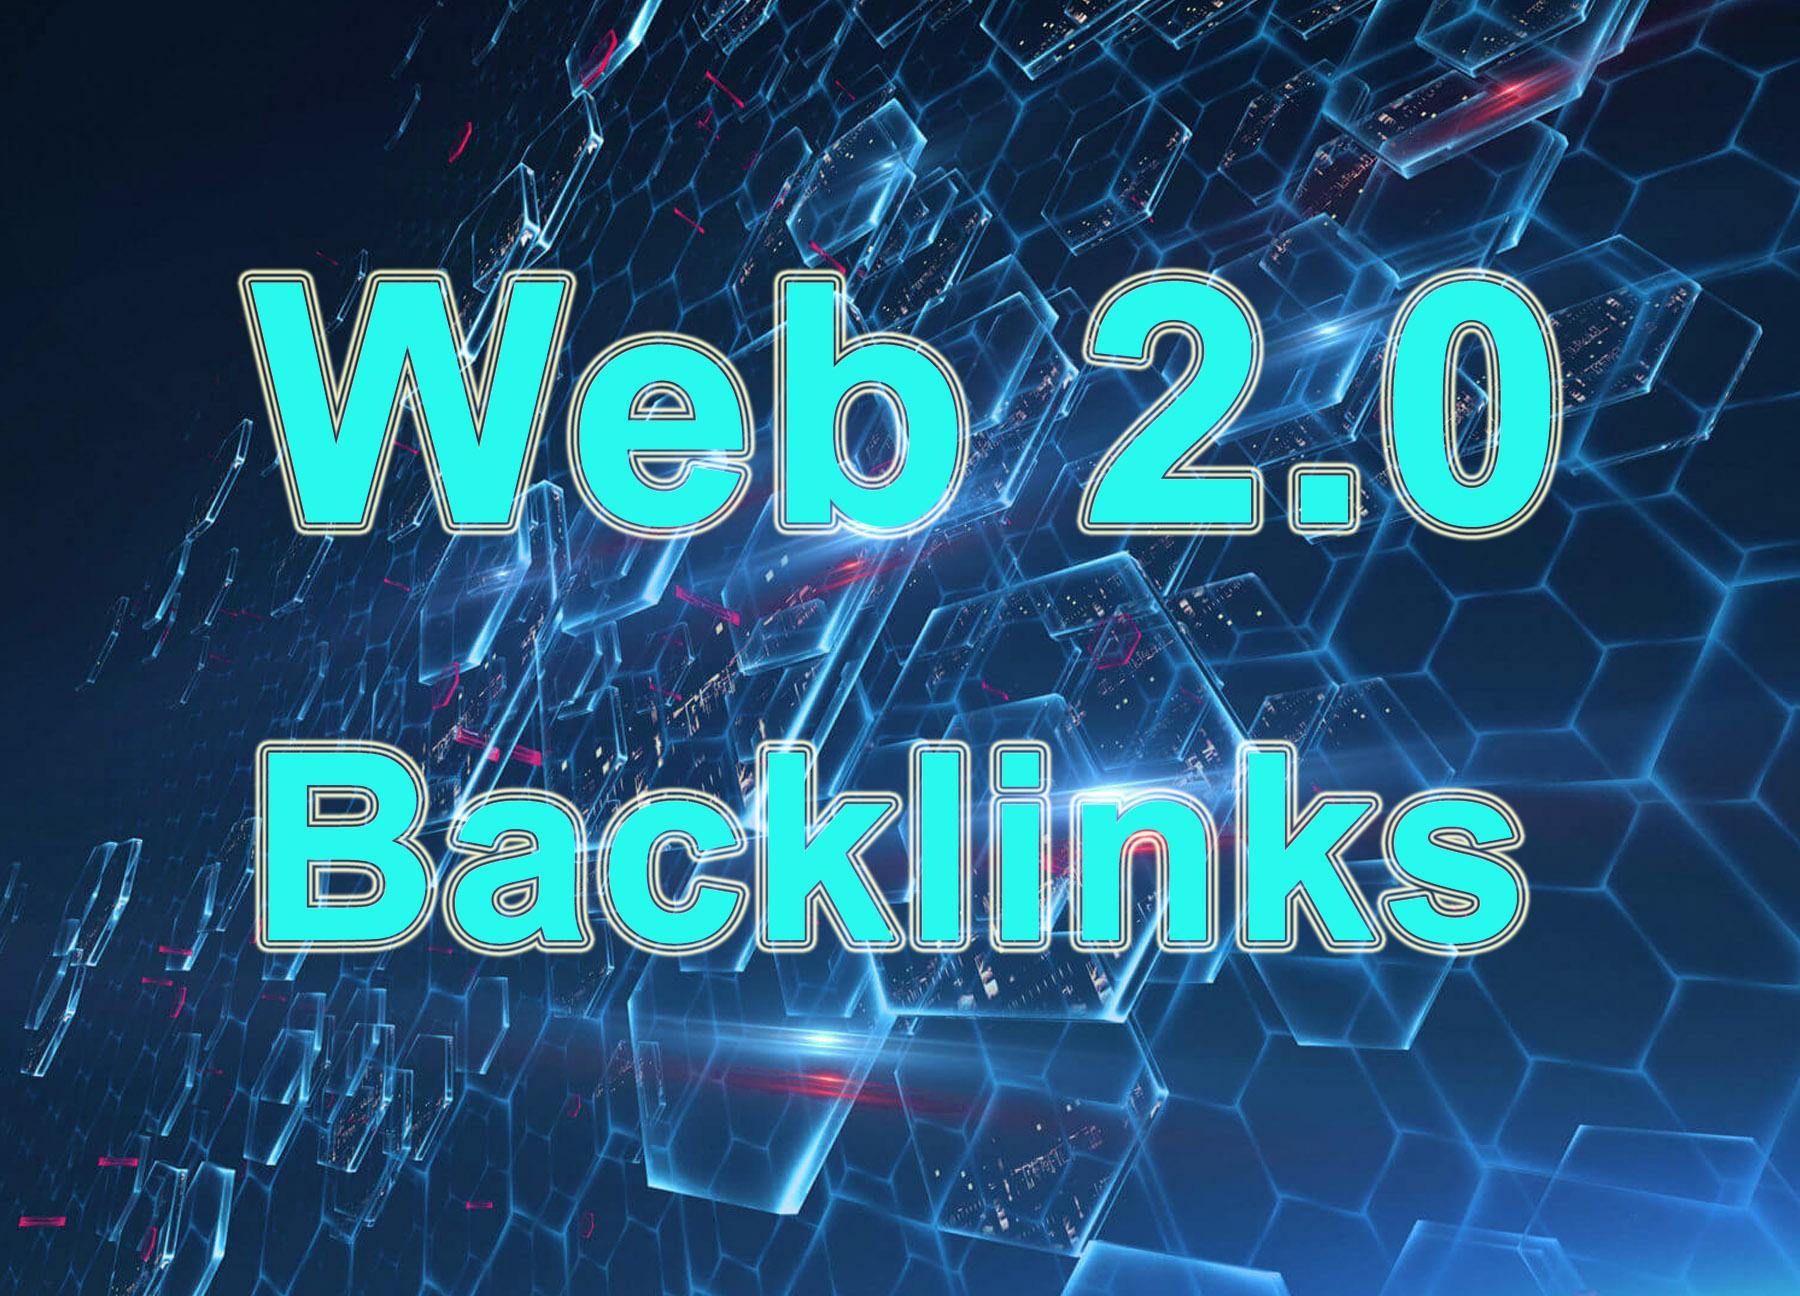 100 web 2.0 backlinks for SEO promotion